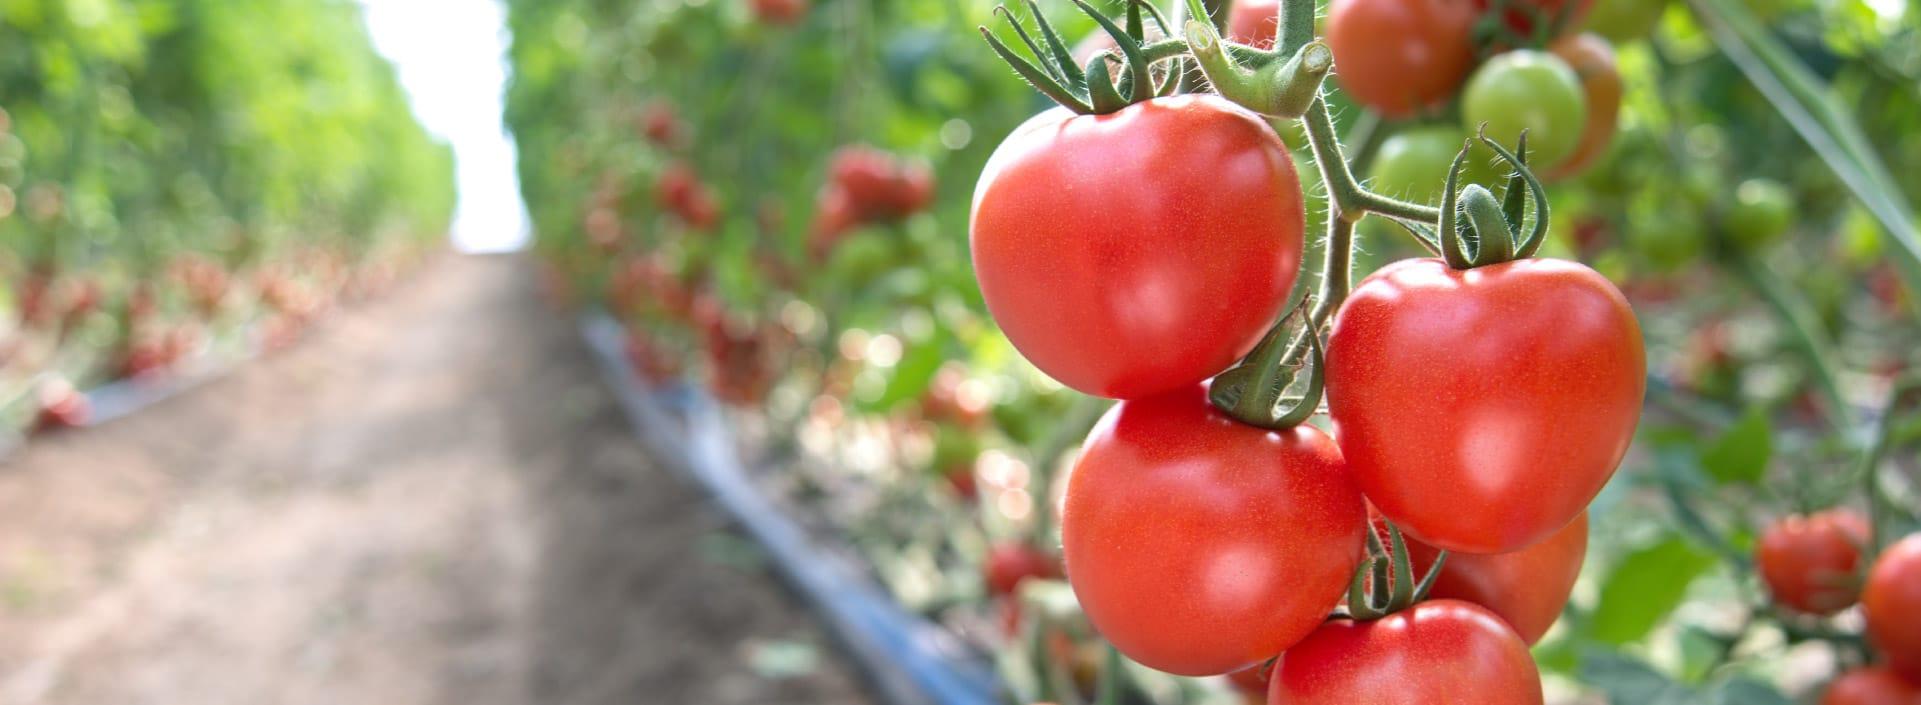 Vine ripened tomatoes header